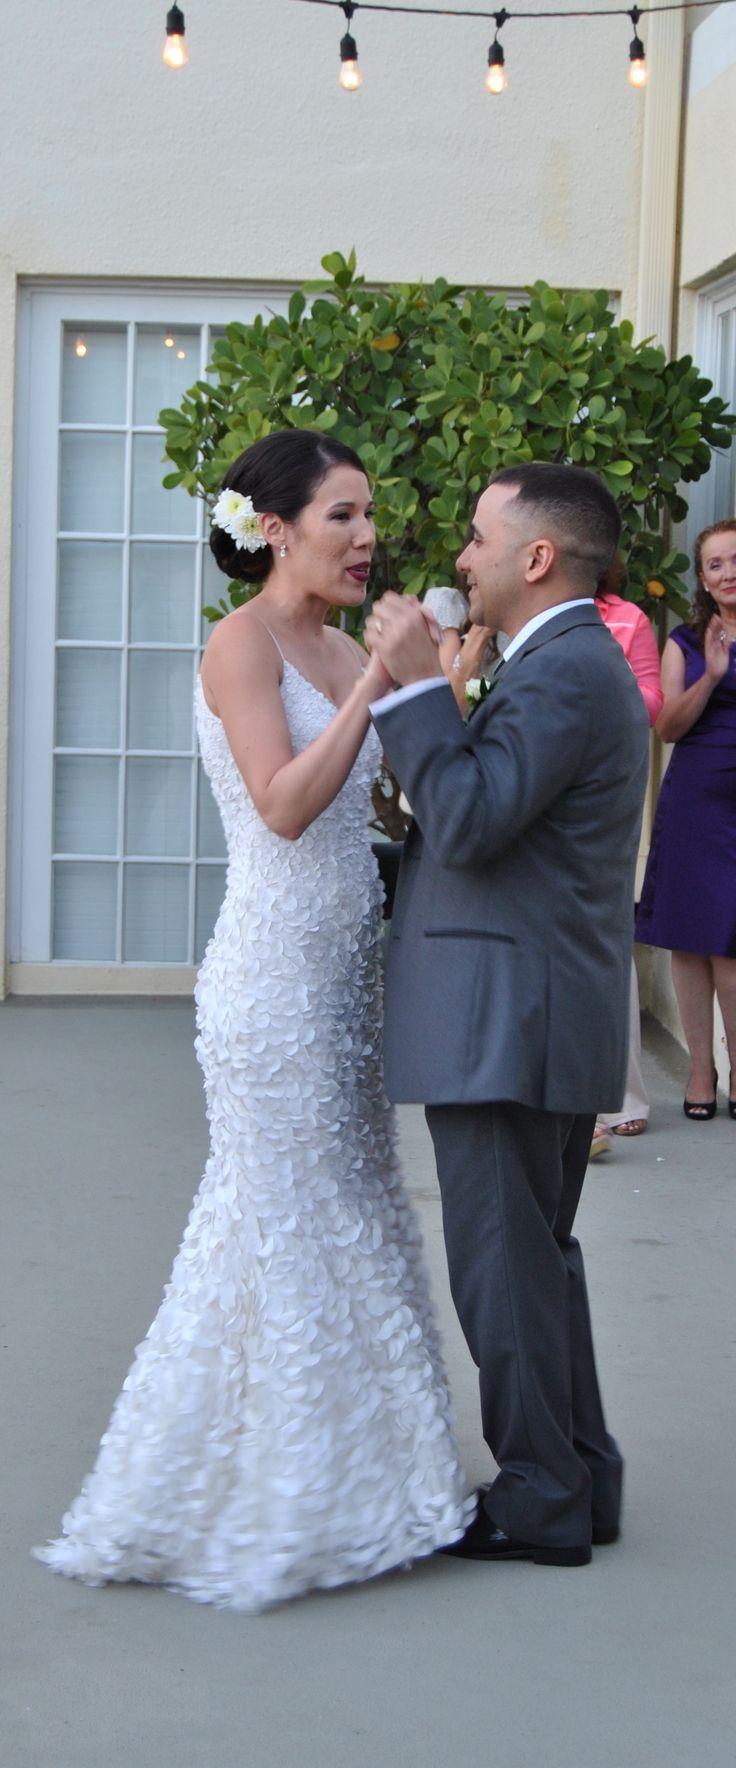 Intimate Moment During First Dance Destinationweddingdj Mbeventdjs Thereachkeywestdj Weddingdj Keywesteventdj Key West